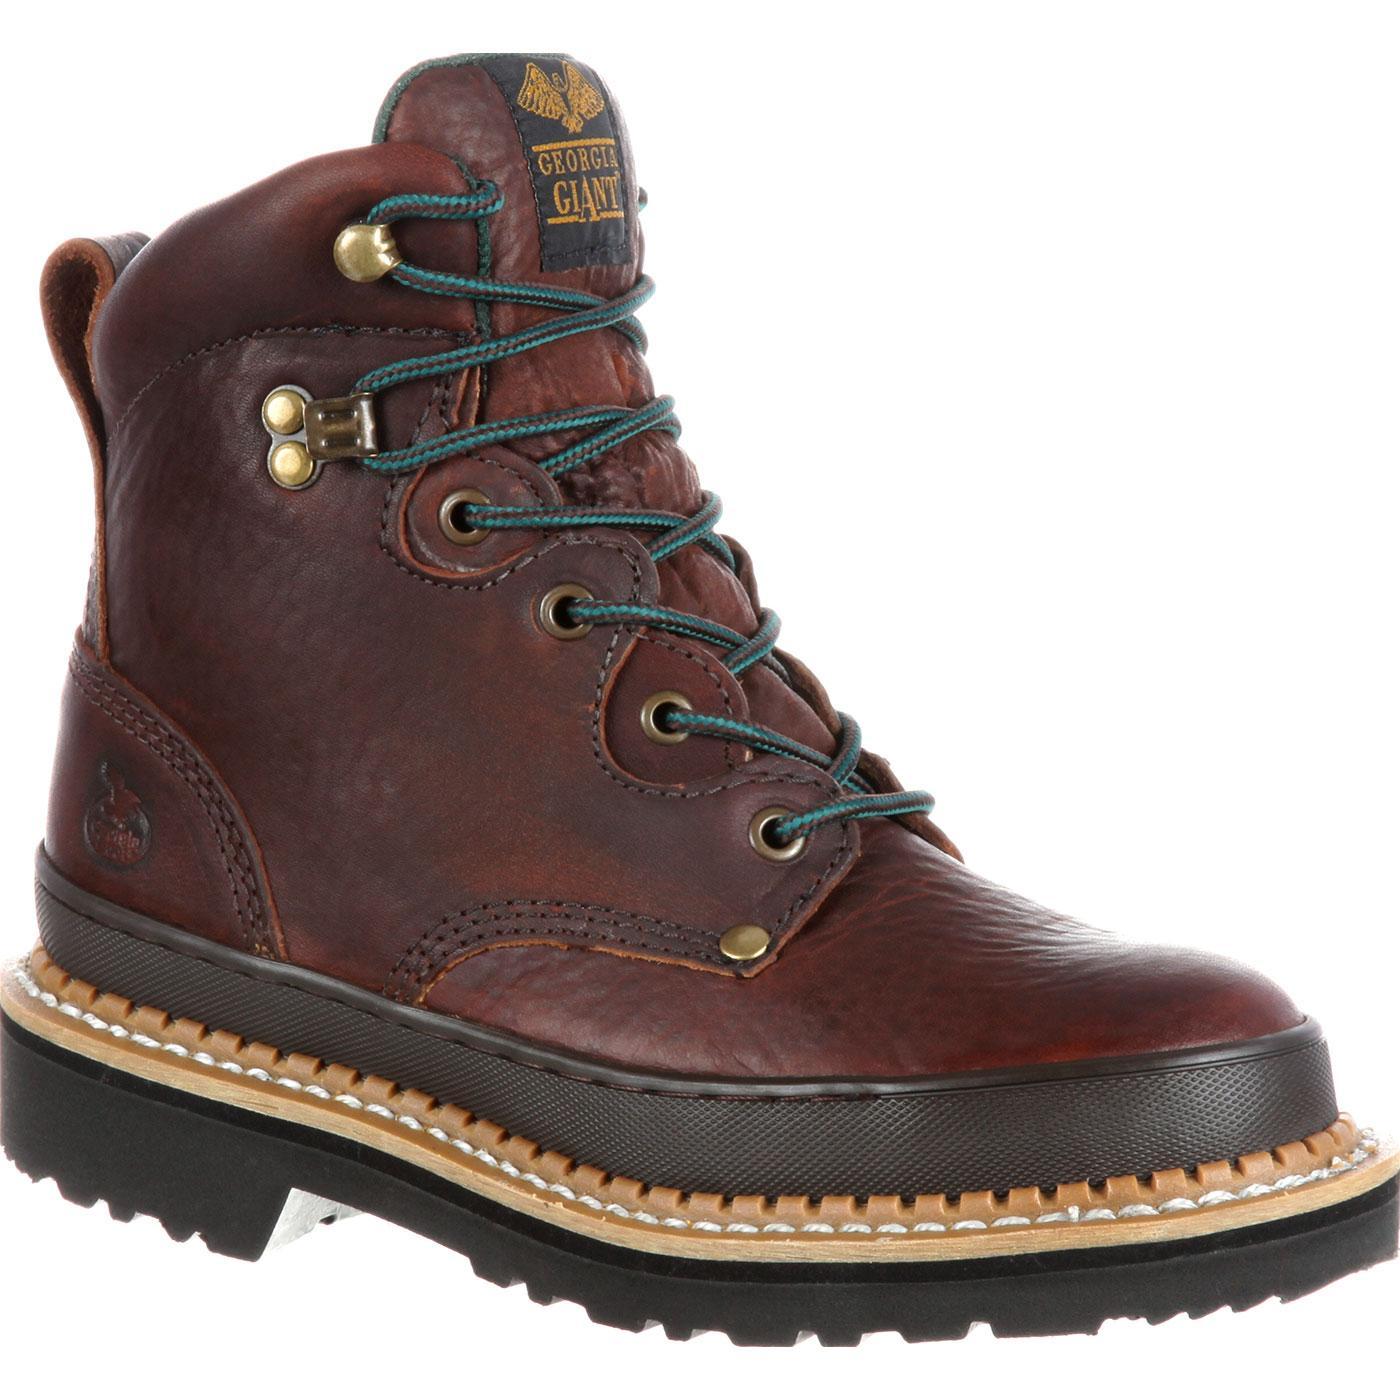 womens work boots georgia giant womenu0027s steel toe work boot, , large SAEUAIB